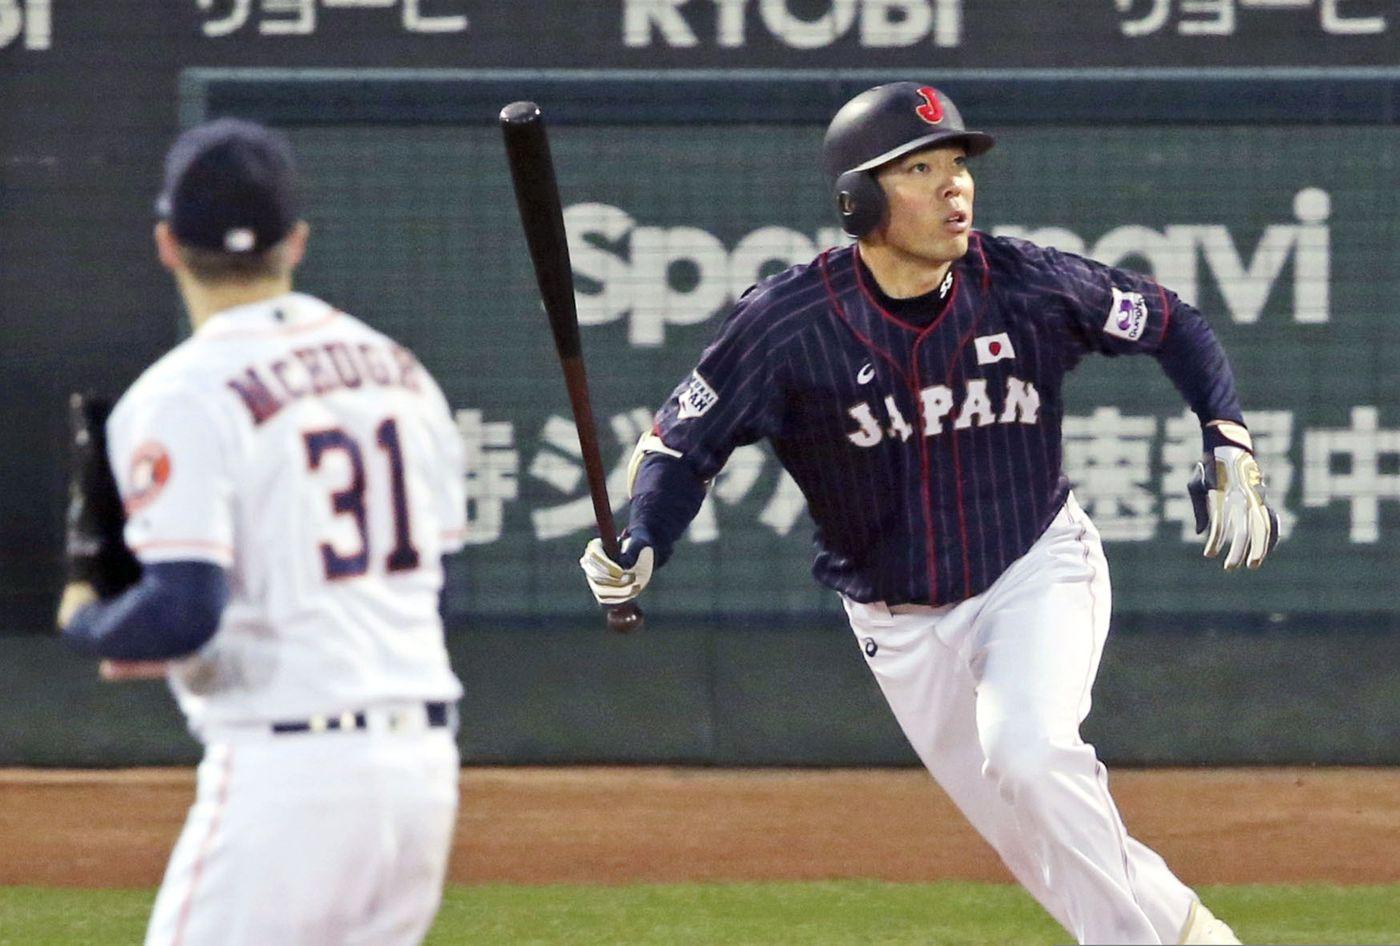 55faa3a7f18 Japan rallies to beat MLB All-Stars 5-3 to lead series 3-1